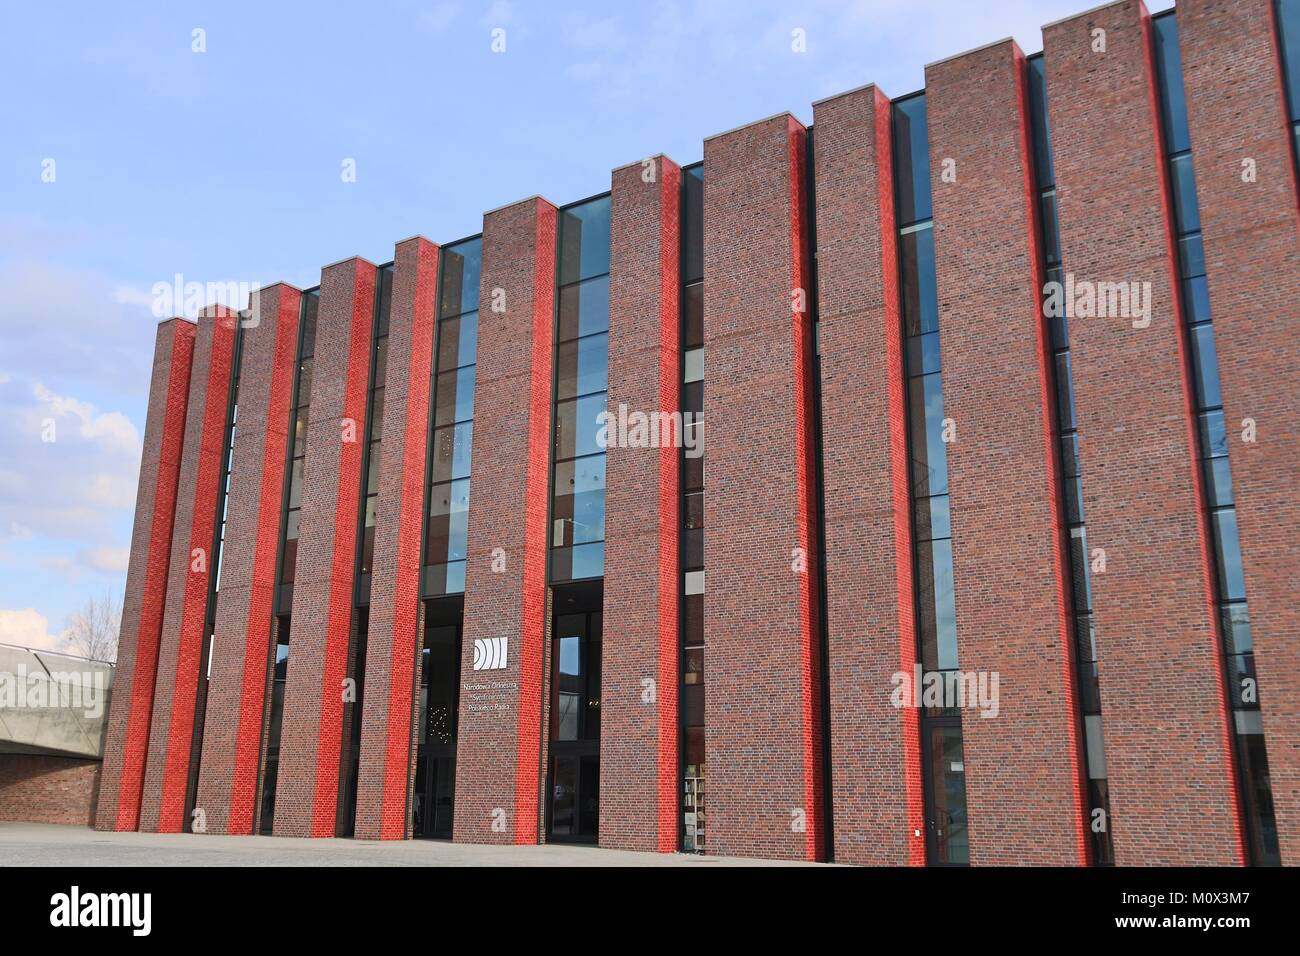 KATOWICE, POLAND - MARCH 5, 2017: Polish National Radio Symphony Orchestra (NOSPR) concert hall in Katowice. The Stock Photo